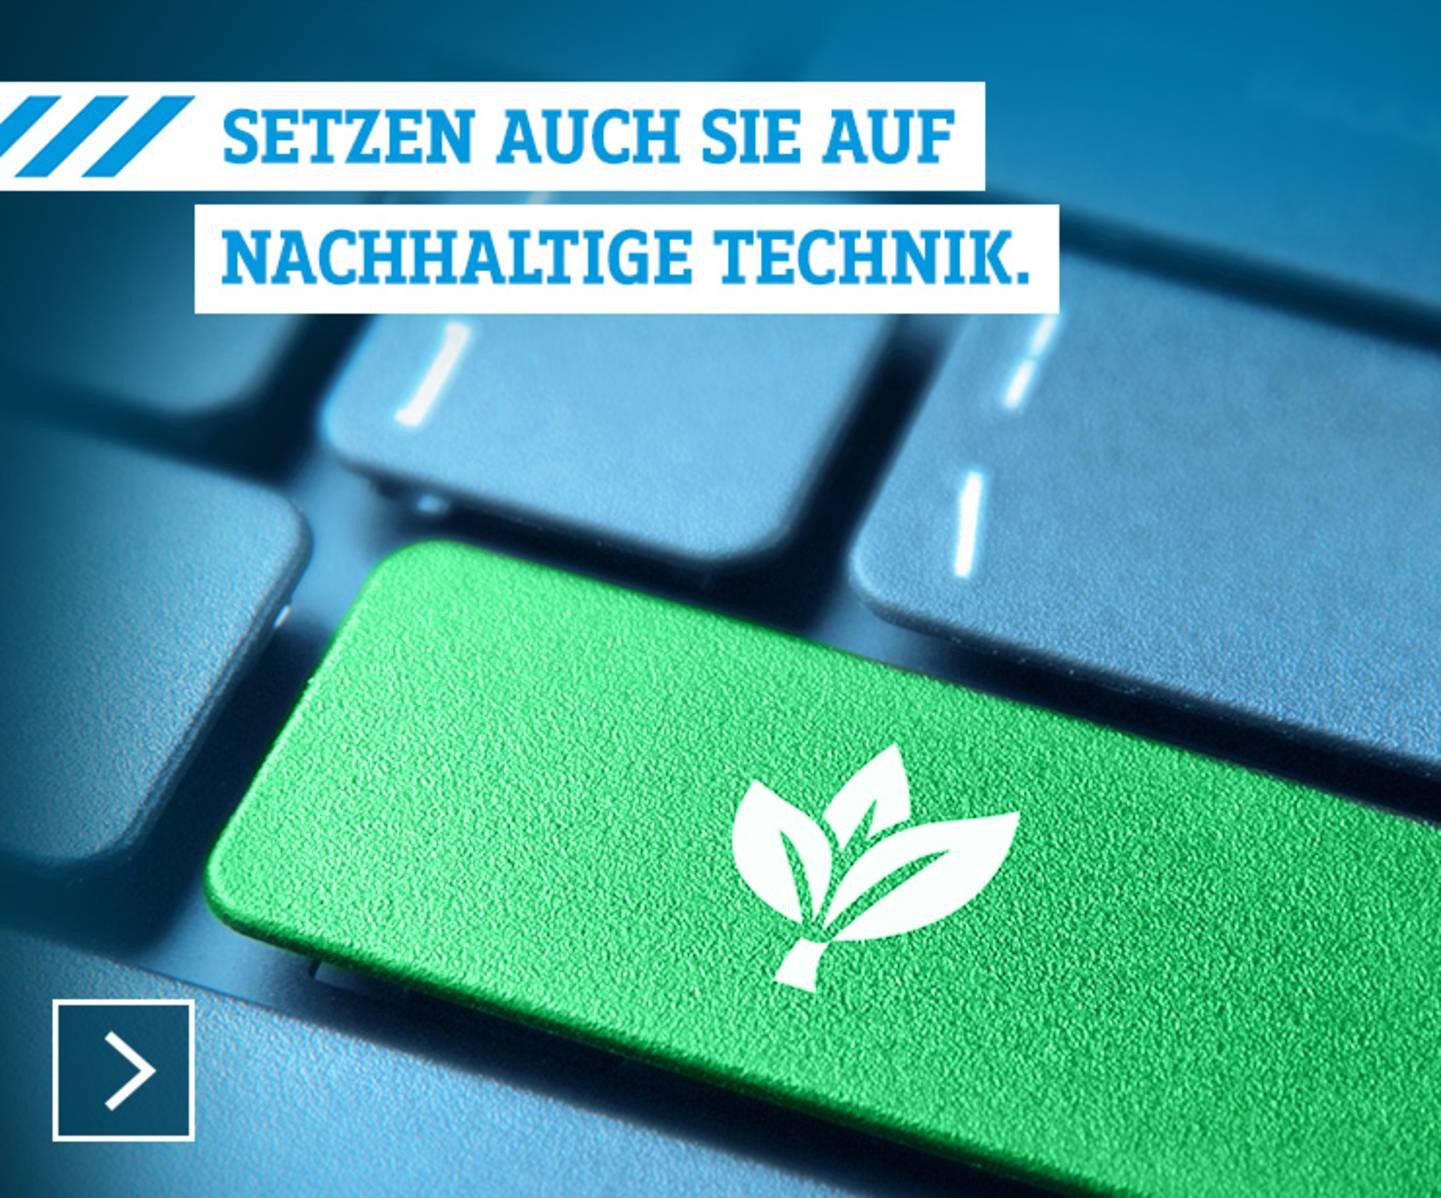 Nachhaltige Technik »